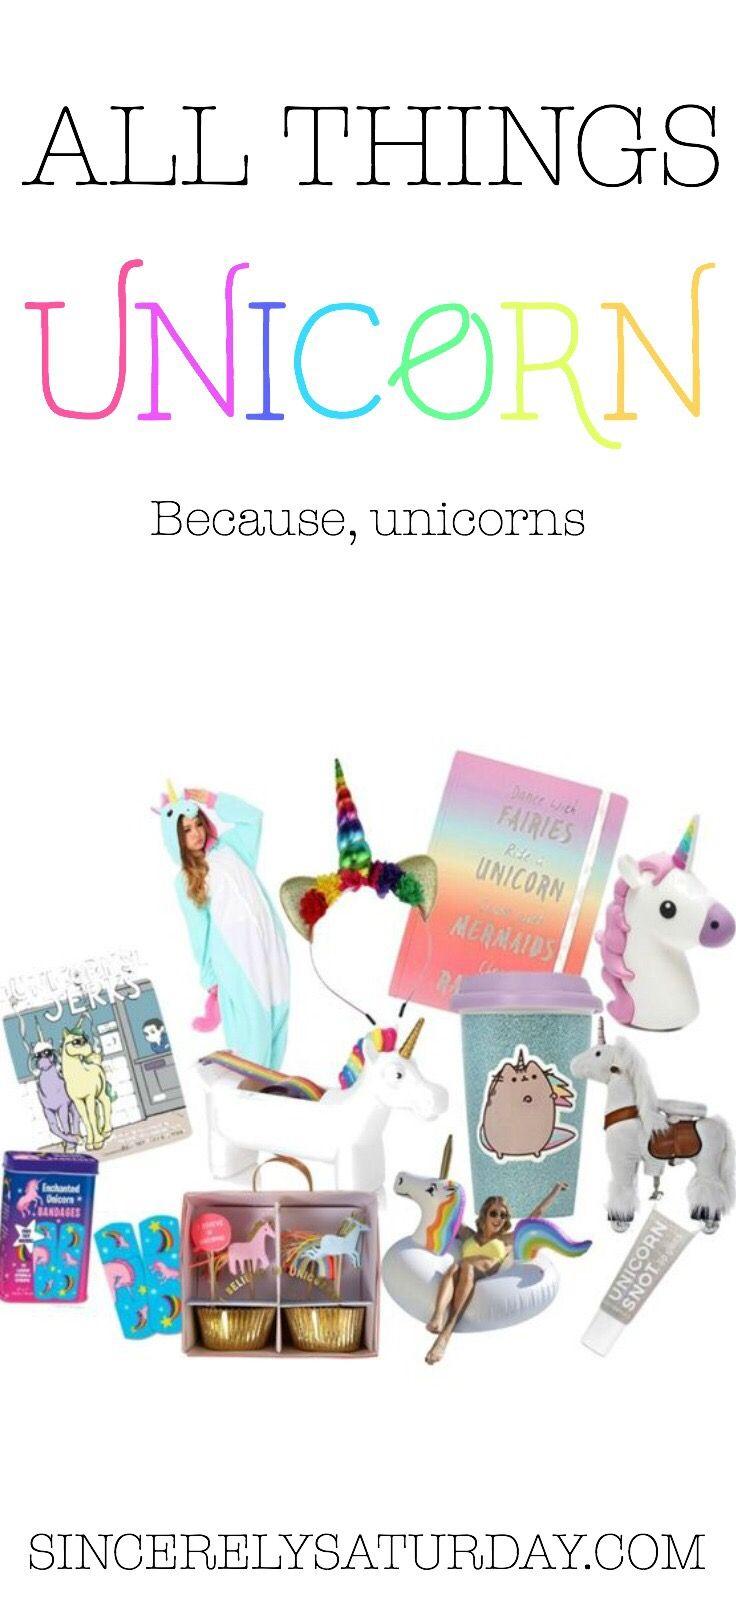 f73dadf4cbf All things unicorn. Unicorn gift ideas. The ultimate list of Unicorn  related products. Unicorn party supplies and ideas. Unicorn gift ideas. Fun  unicorn ...